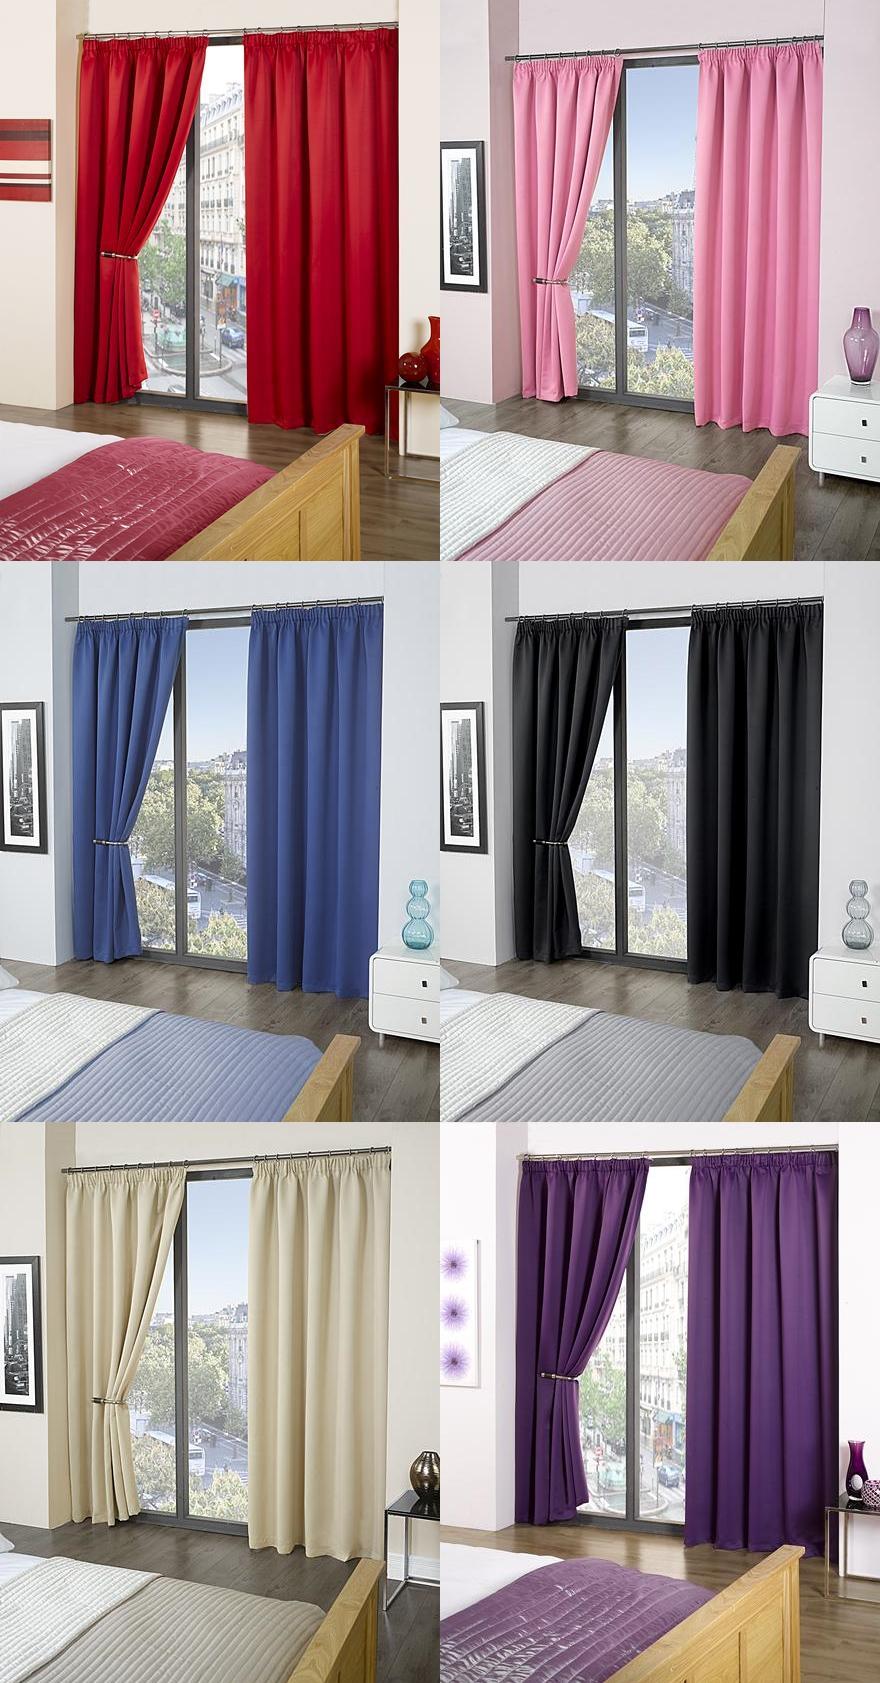 rideaux isolants opaques embrasses incluses haut de gamme ebay. Black Bedroom Furniture Sets. Home Design Ideas